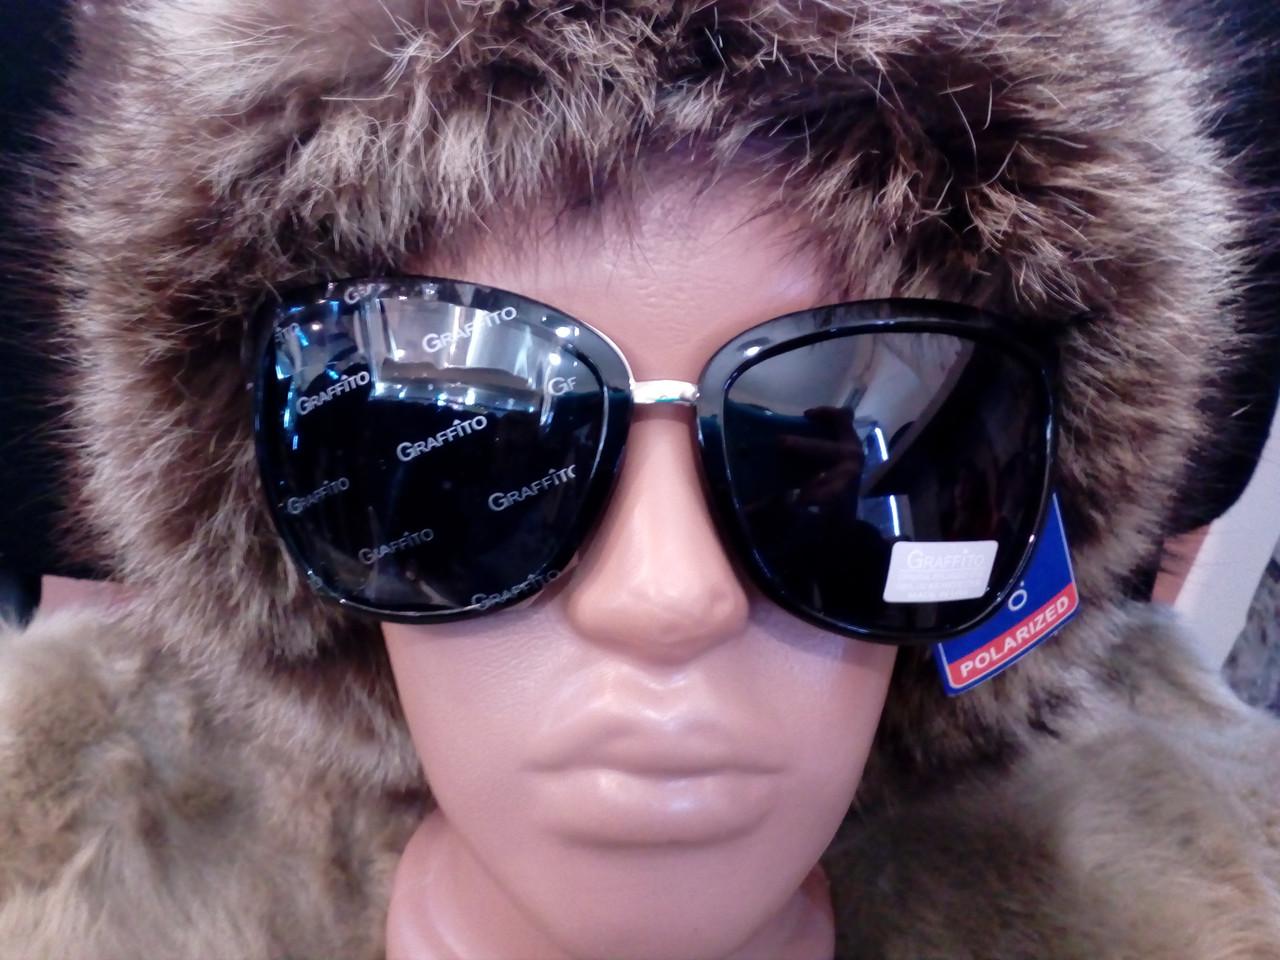 Солнцезащитные очки Graffito.